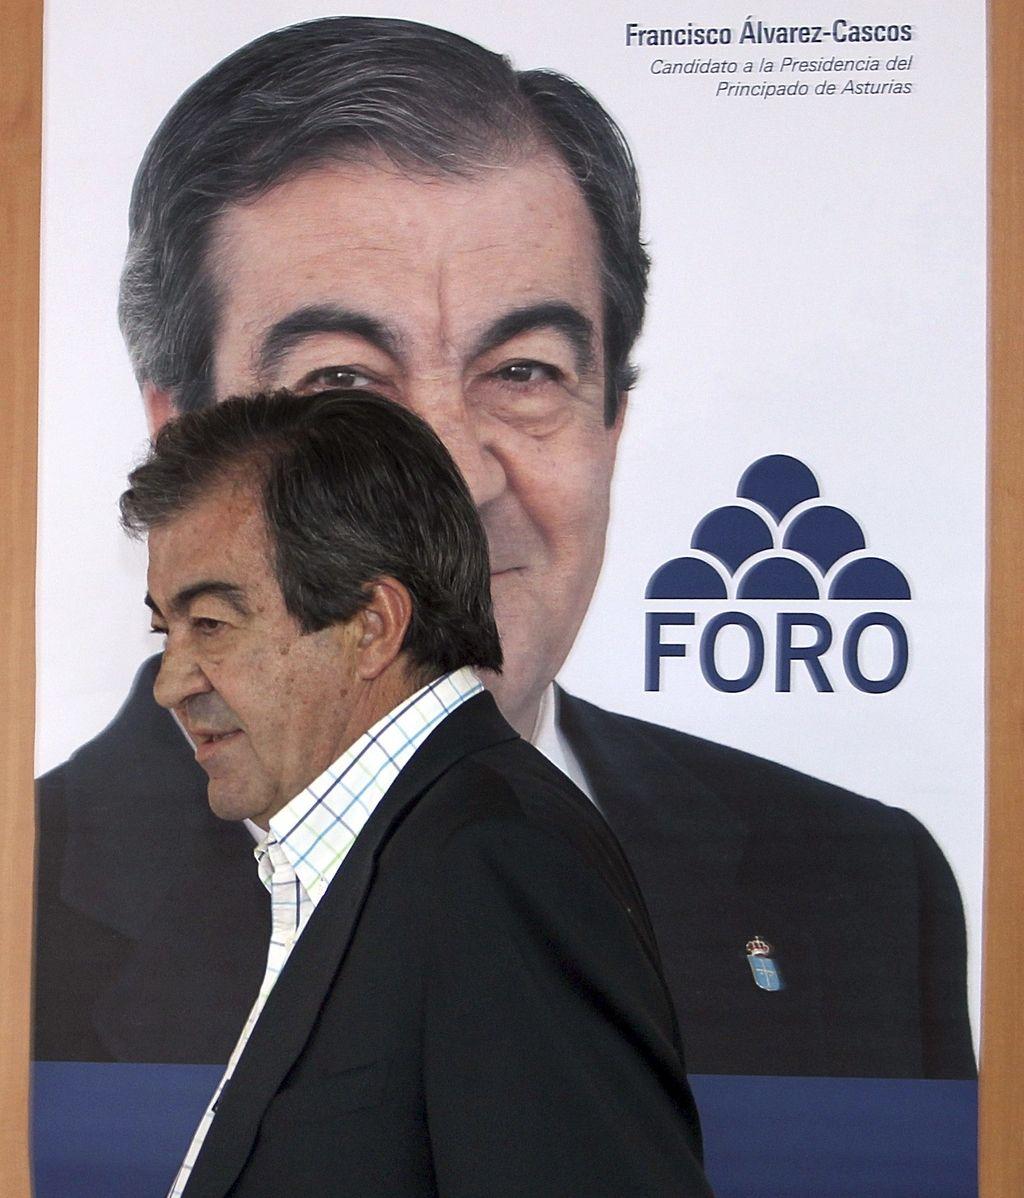 El presidente de Foro, Francisco Álvarez Cascos